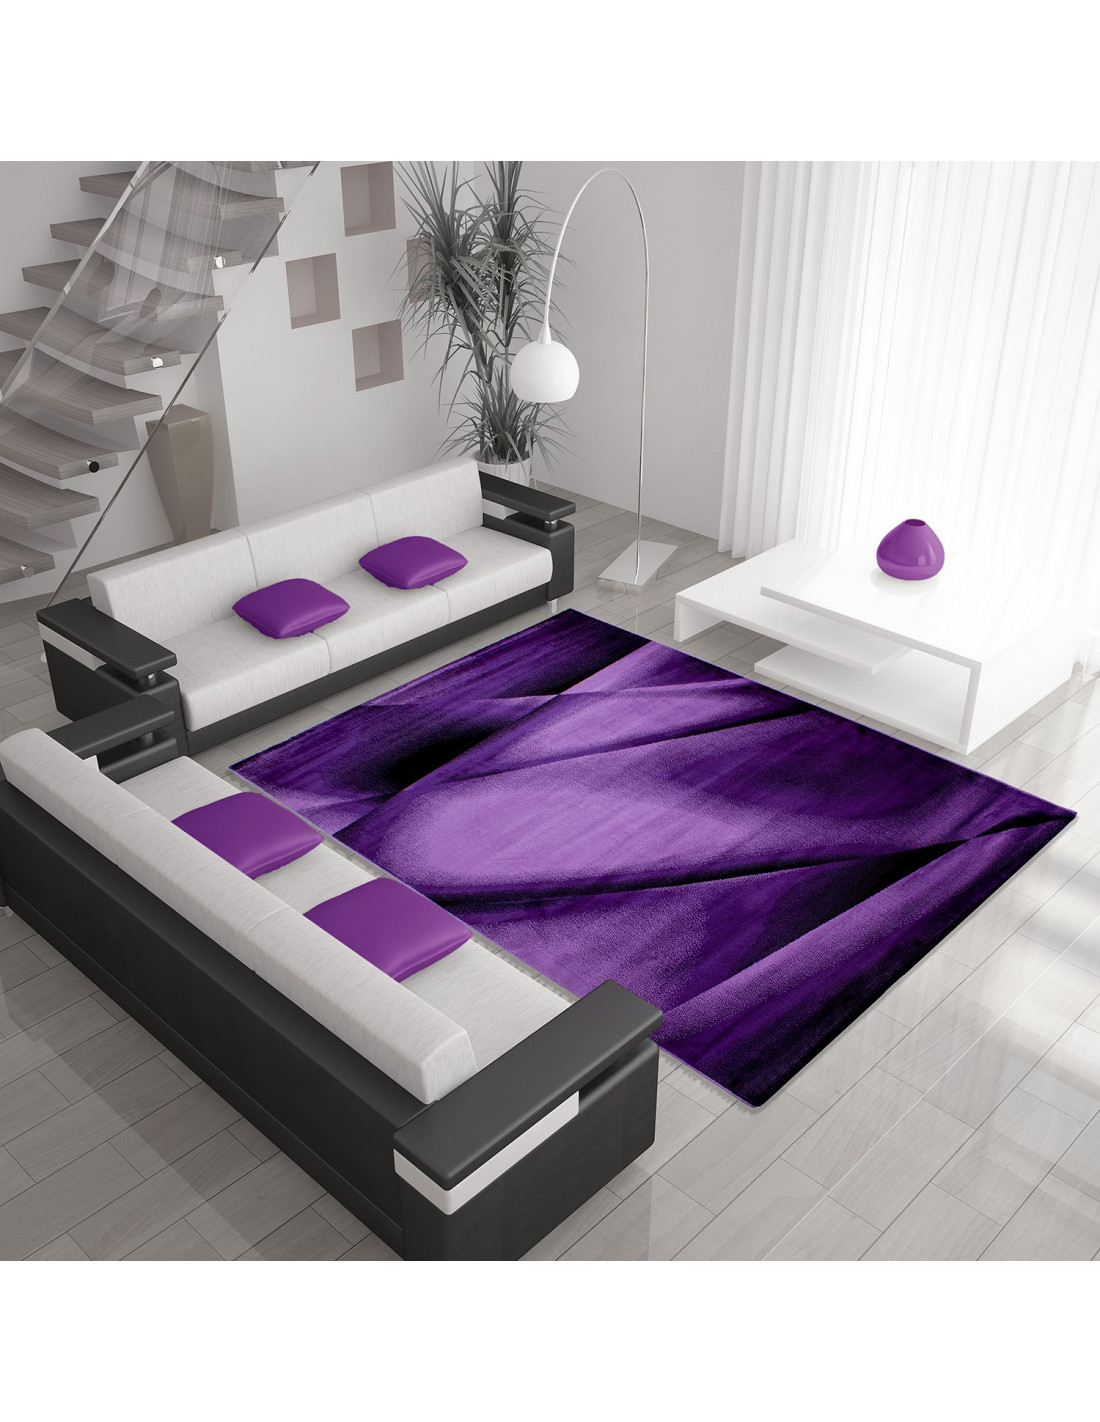 Modern designer living room rug MIAMI 6590 LILA